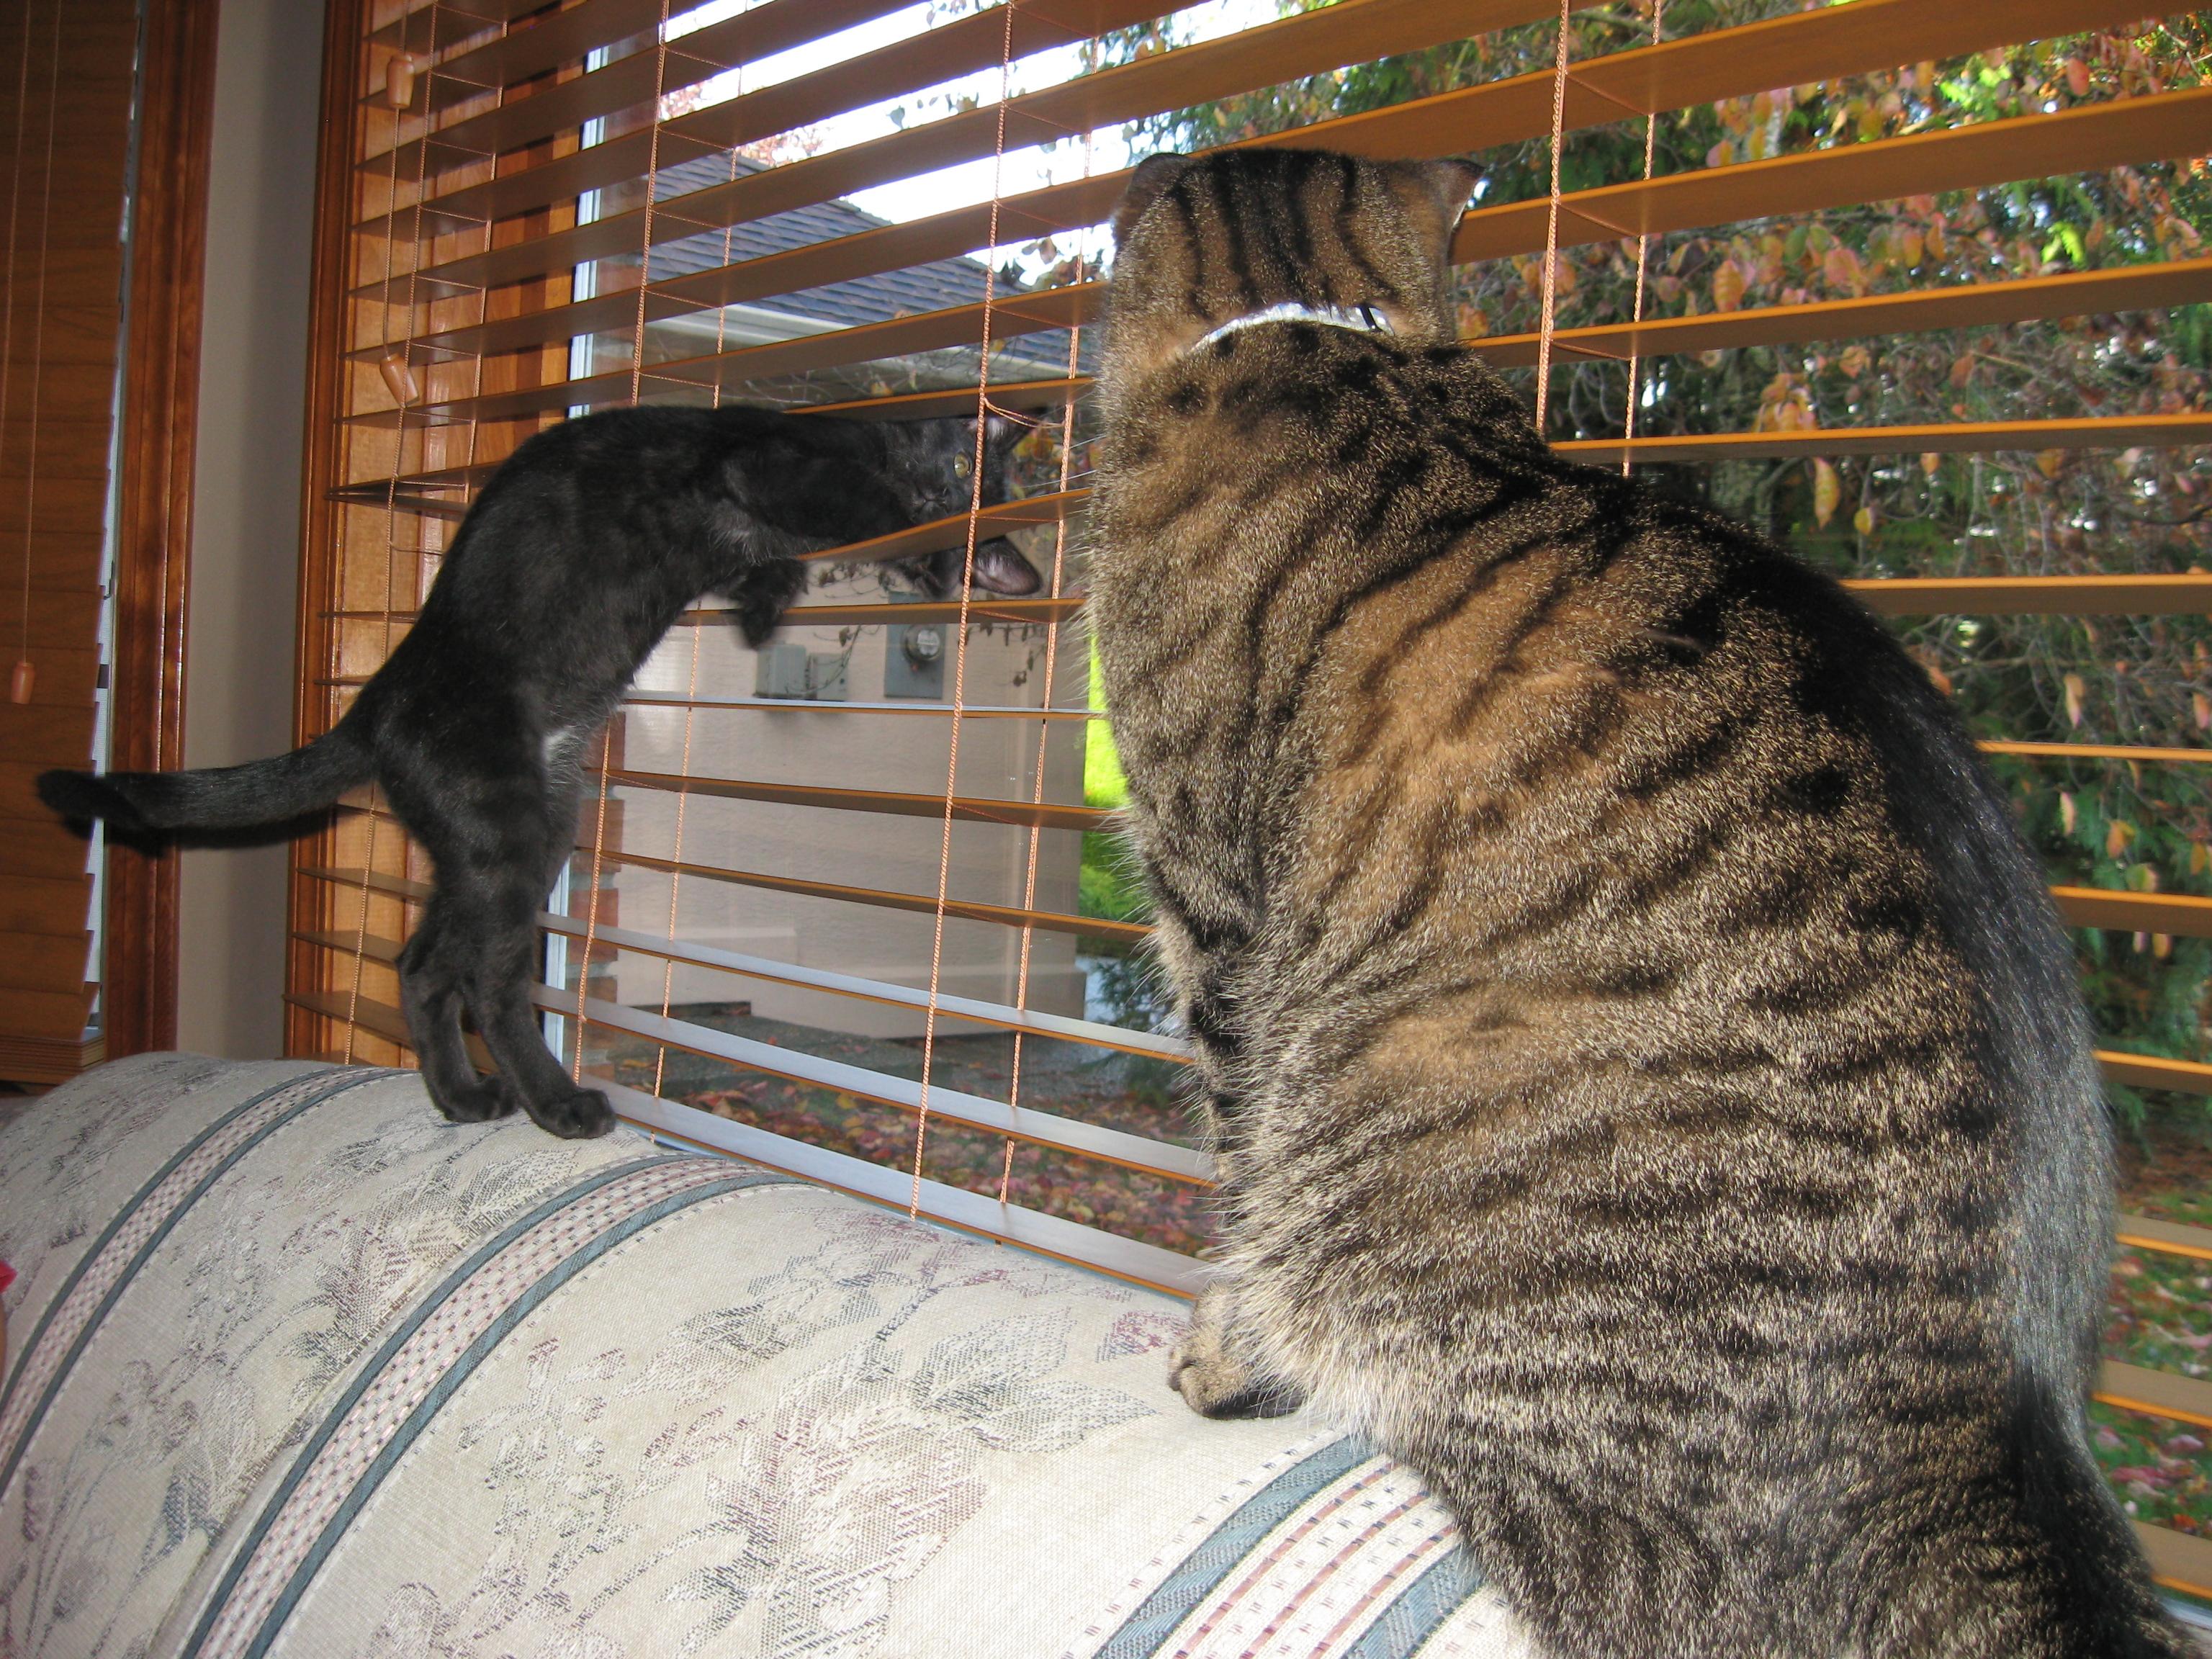 Black kitten showing off to older Tabby cat